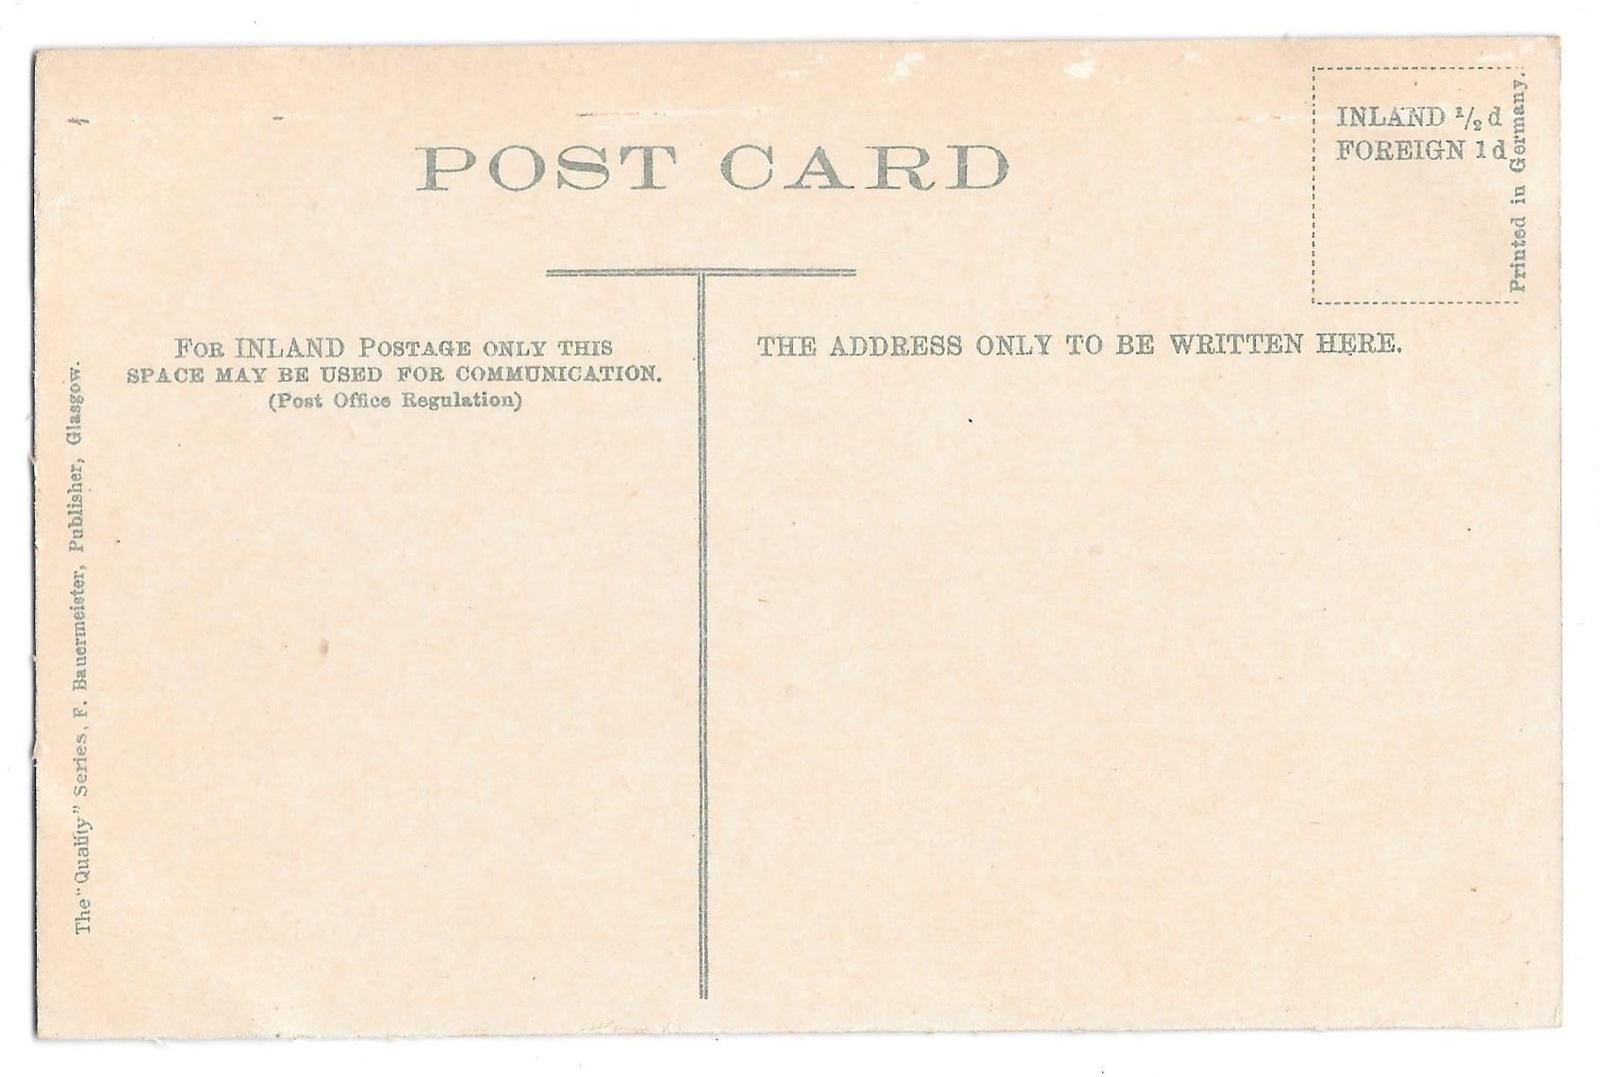 Scotland Glasgow University F Bauermeister Quality Series Vintage Postcard UK